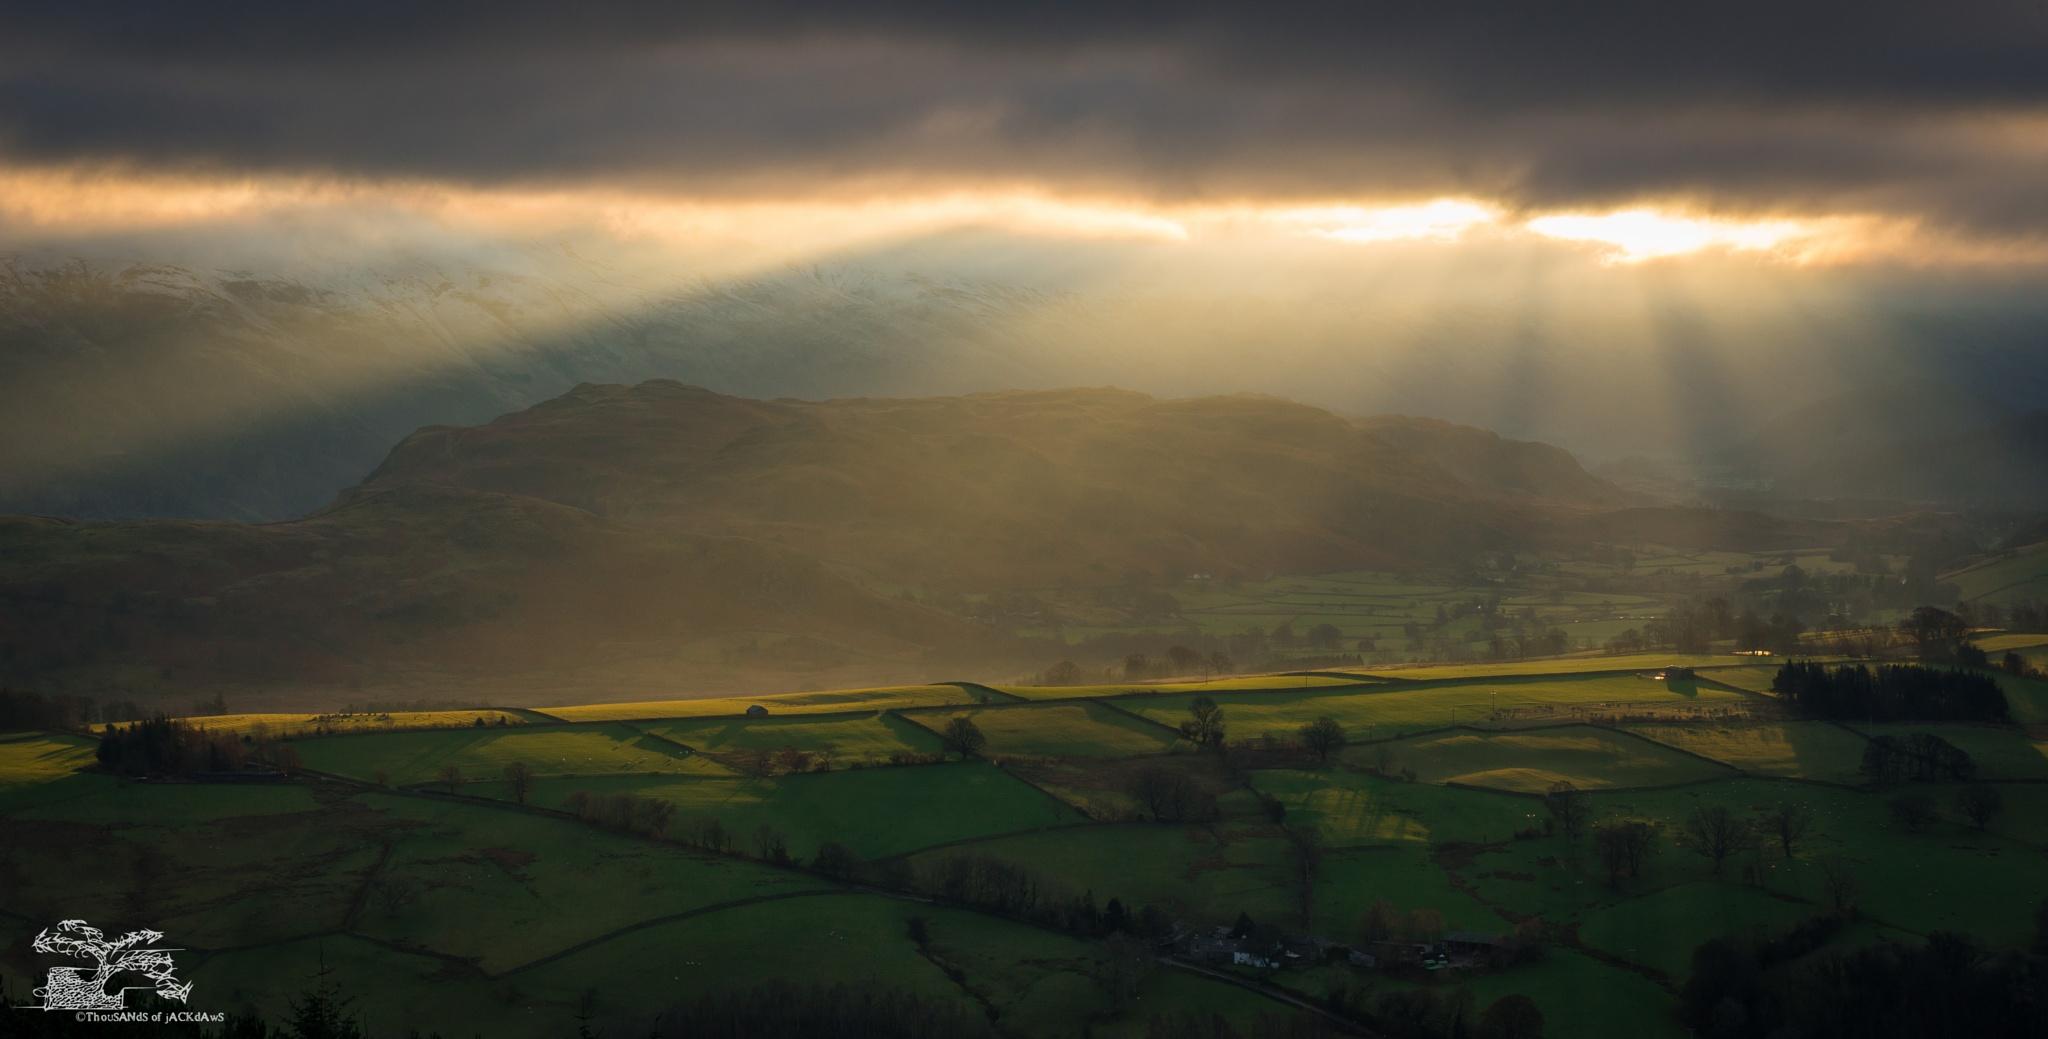 Sunbeams by Jonathan Thursfield